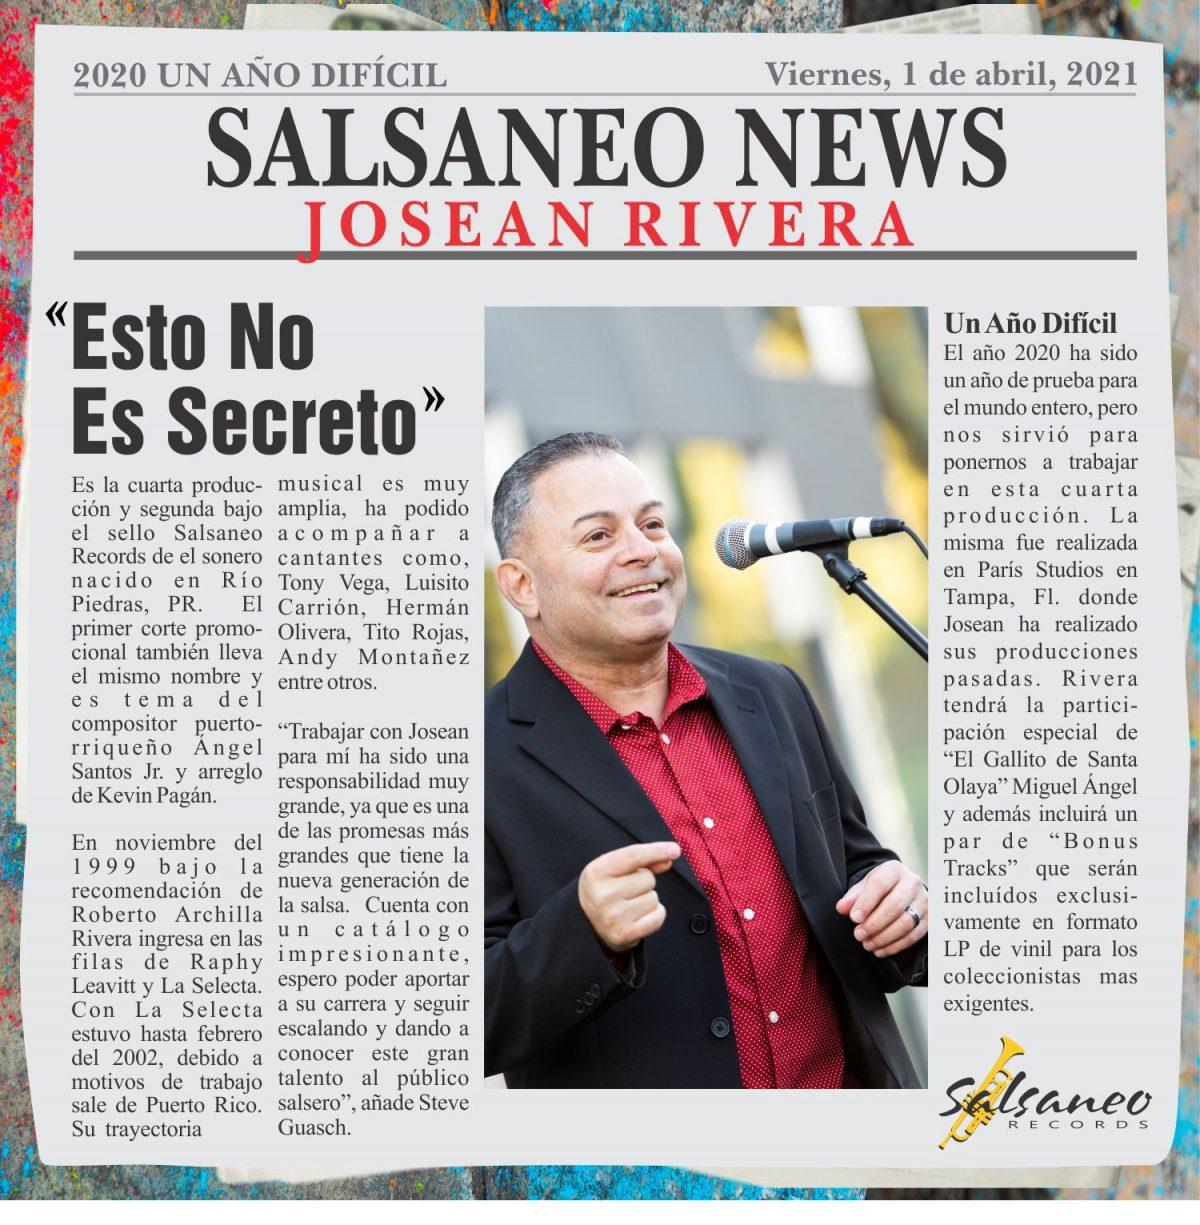 ESTO NO ES SECRETO -Josean Rivera